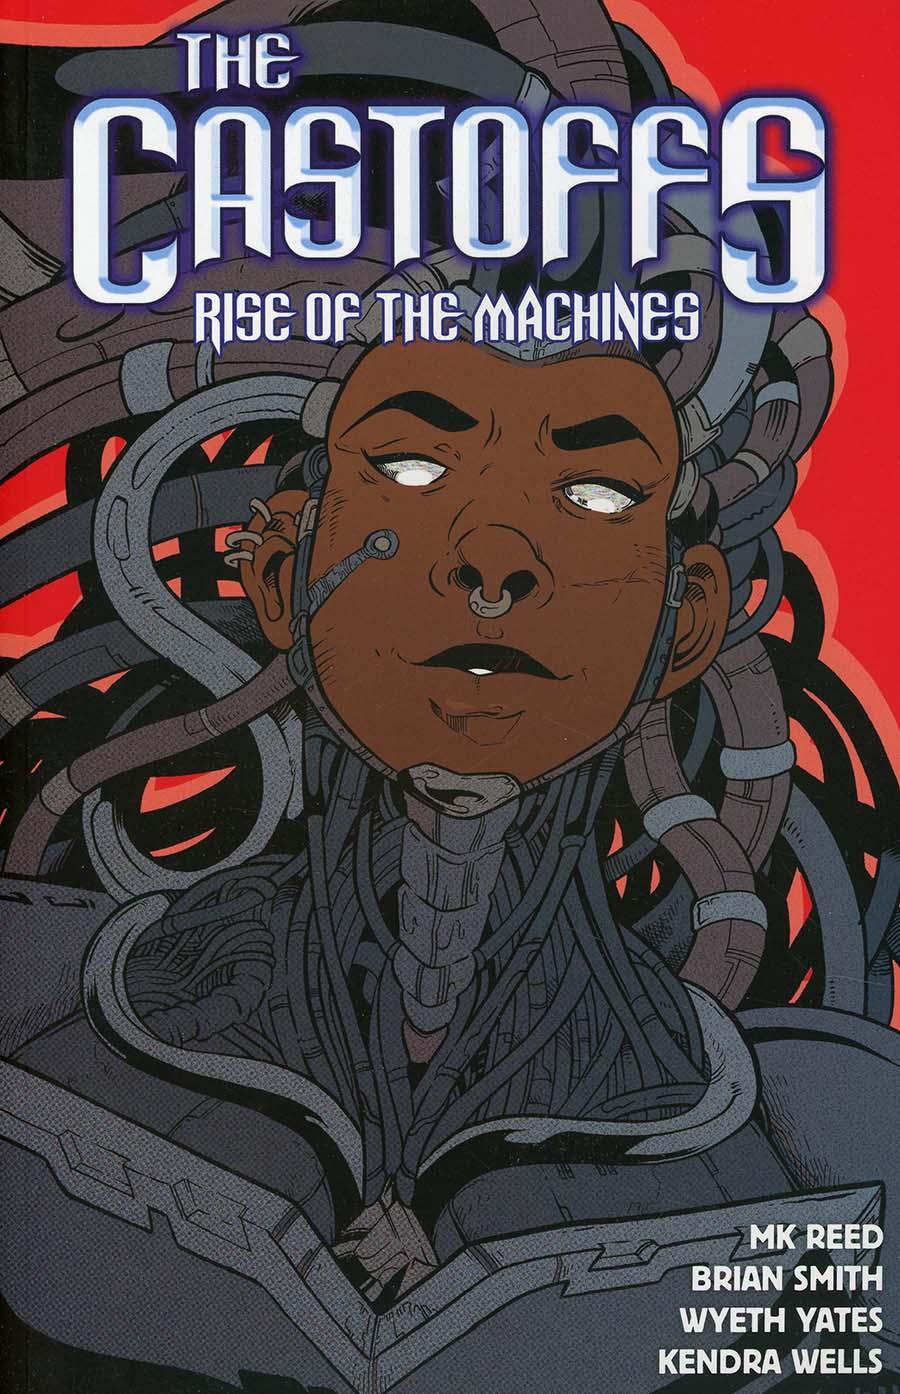 Castoffs Vol 3 Rise Of The Machines TP